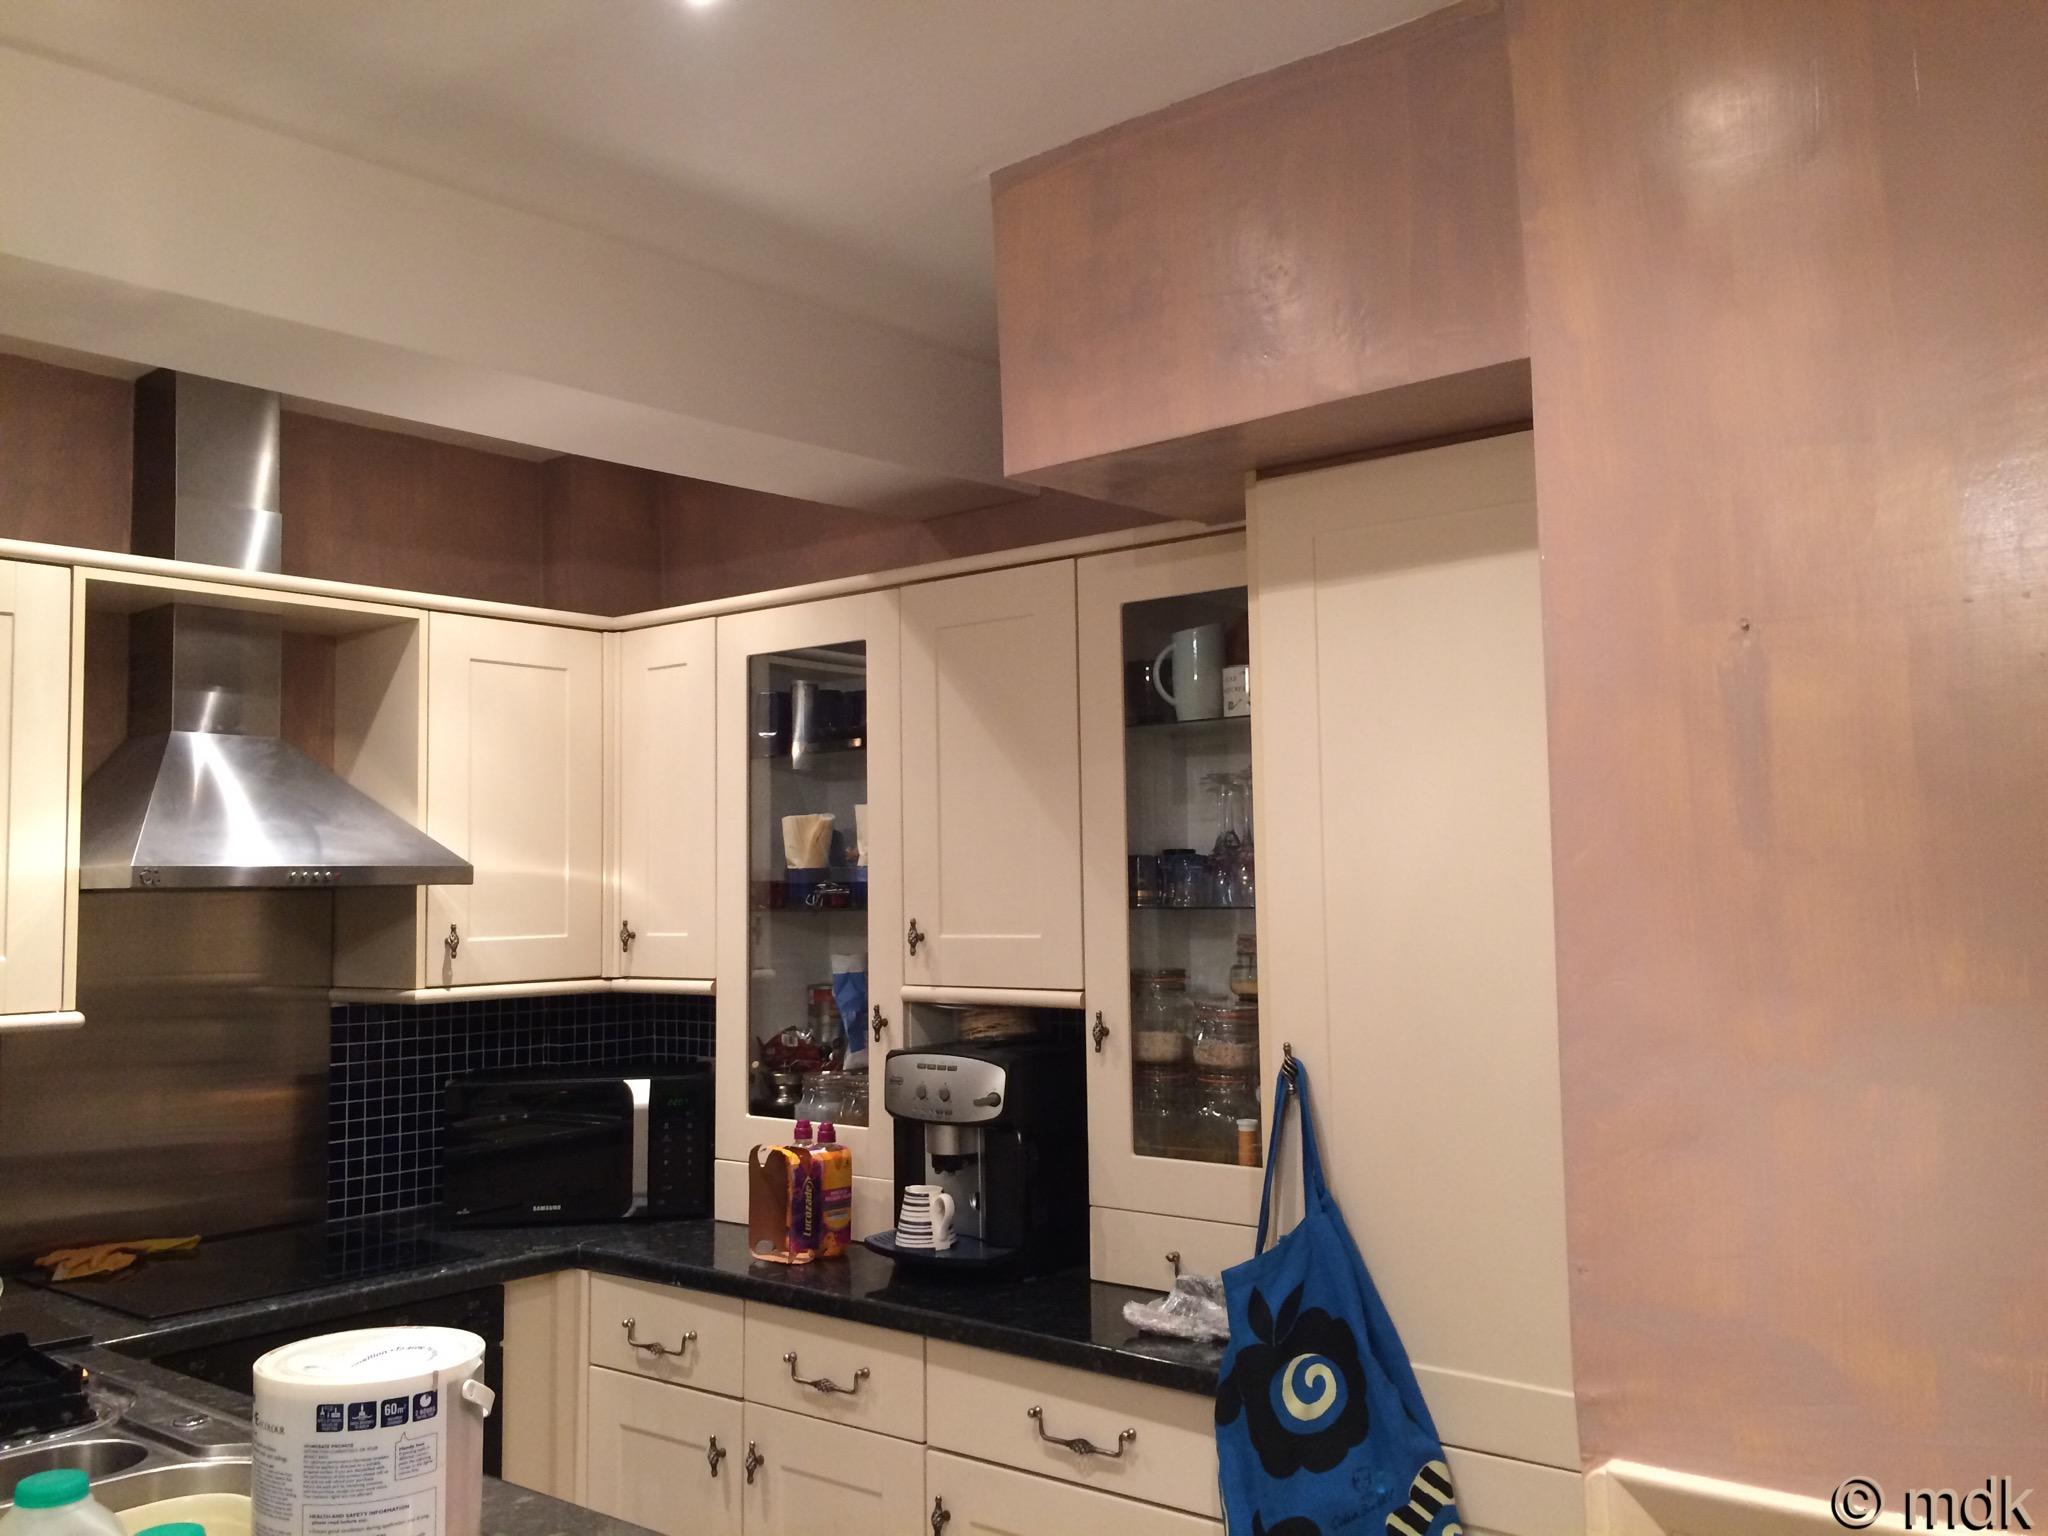 Suddenly a big kitchen doesn't seem like a good idea!